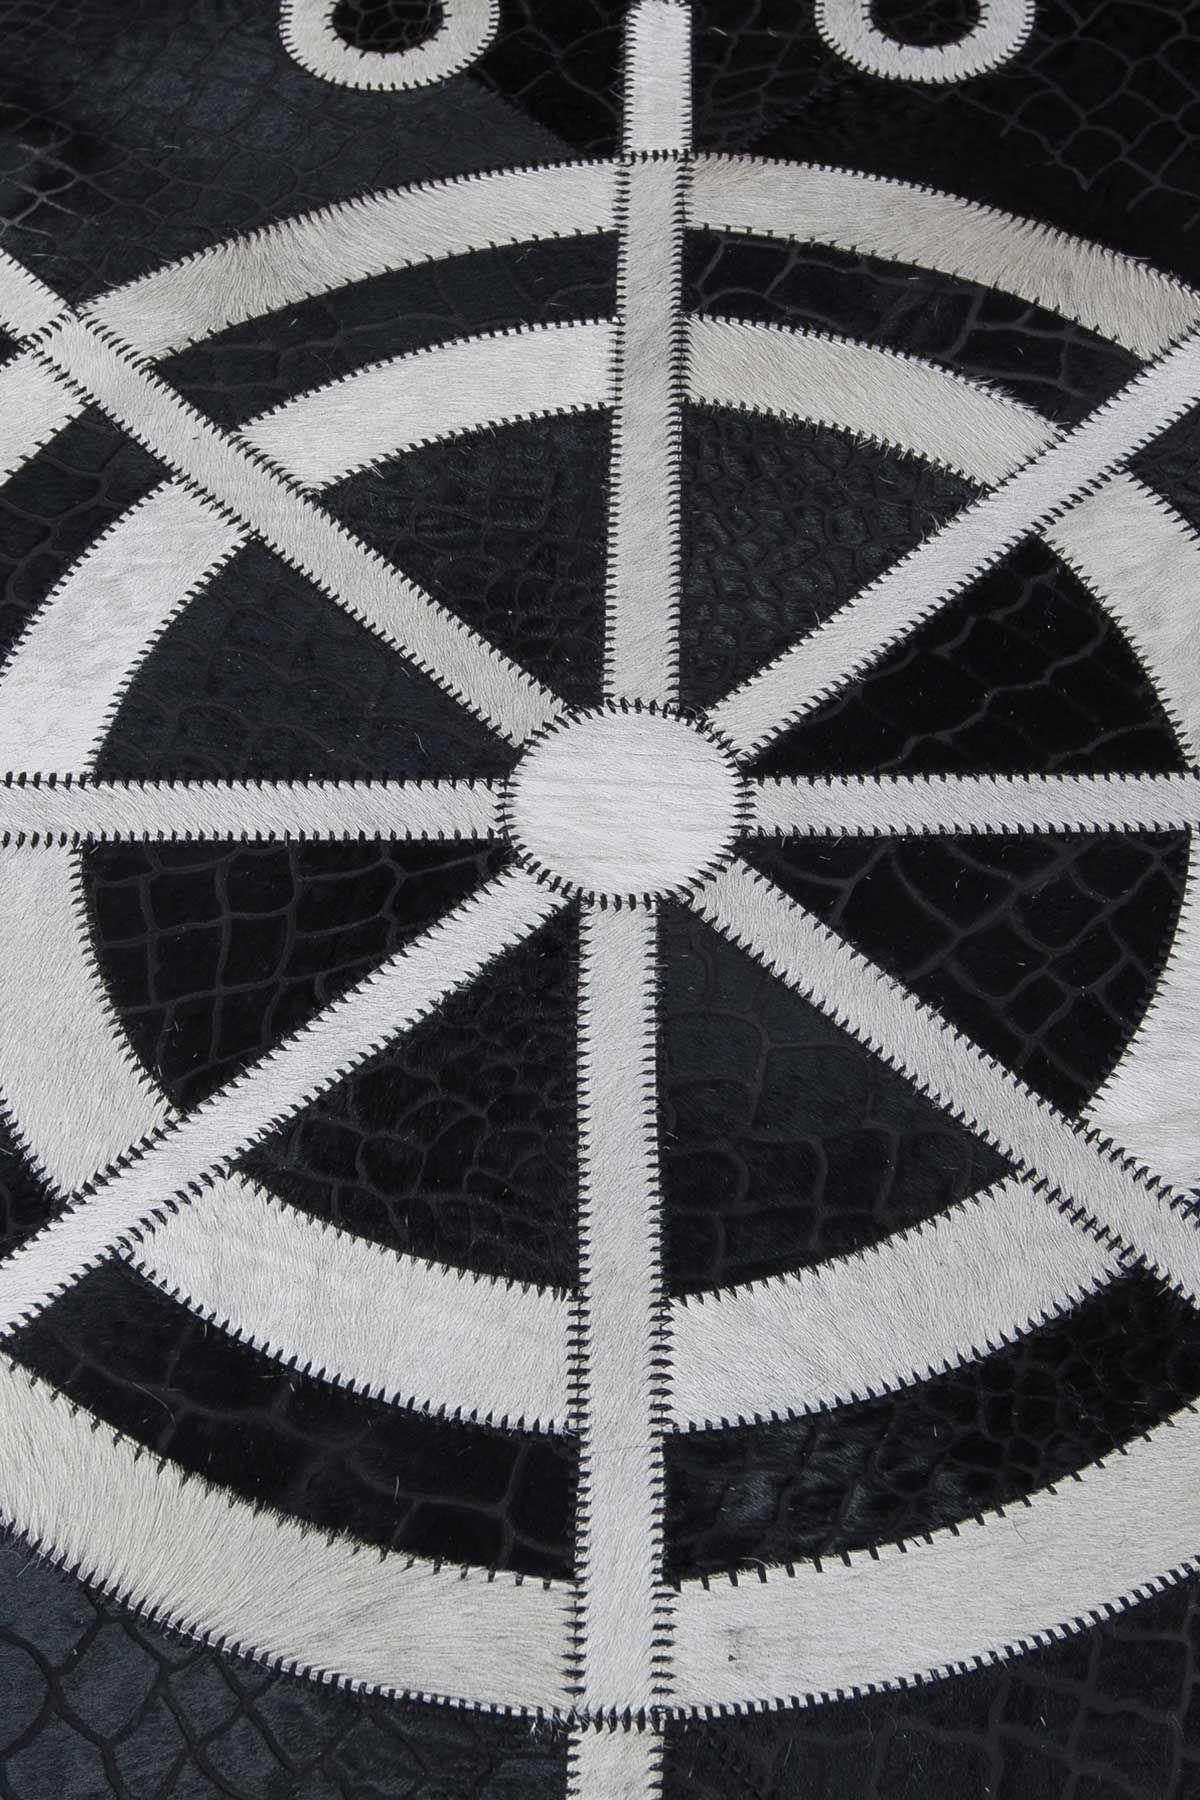 Erdogan Deri Calfskin Rug With Maritime Pattern Black